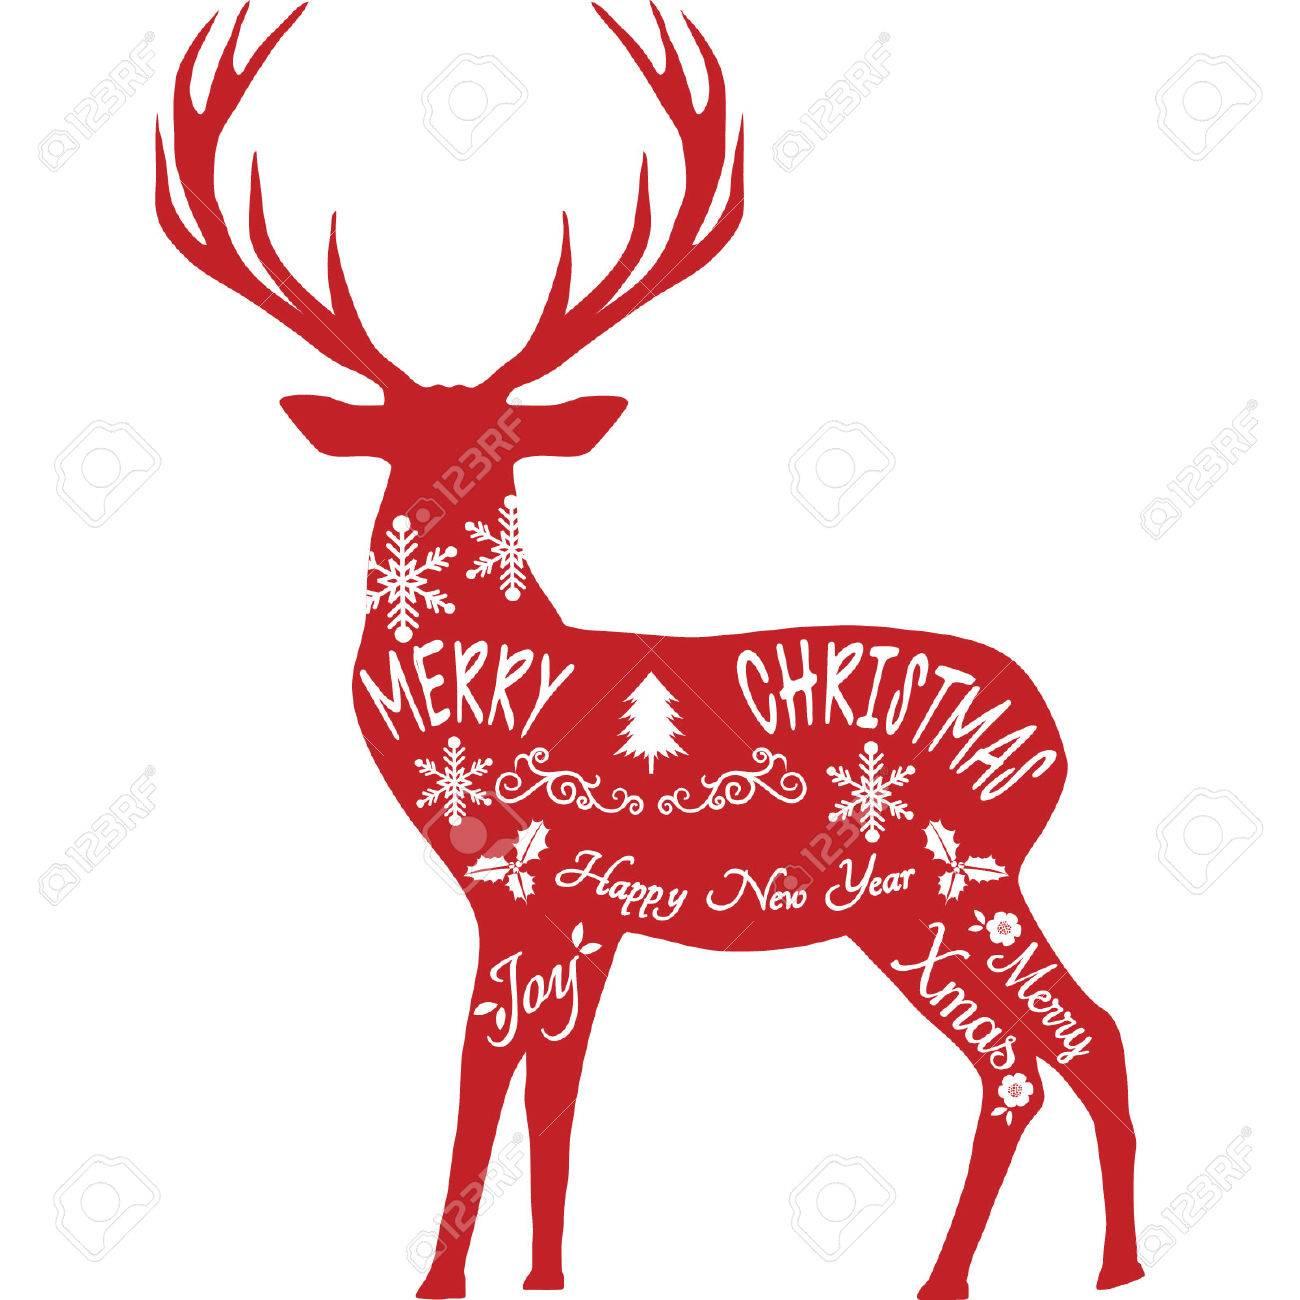 Christmas Reindeer Silhouette.Merry Christmas Reindeer Reindeer Silhouette Red Reindeer Isolated